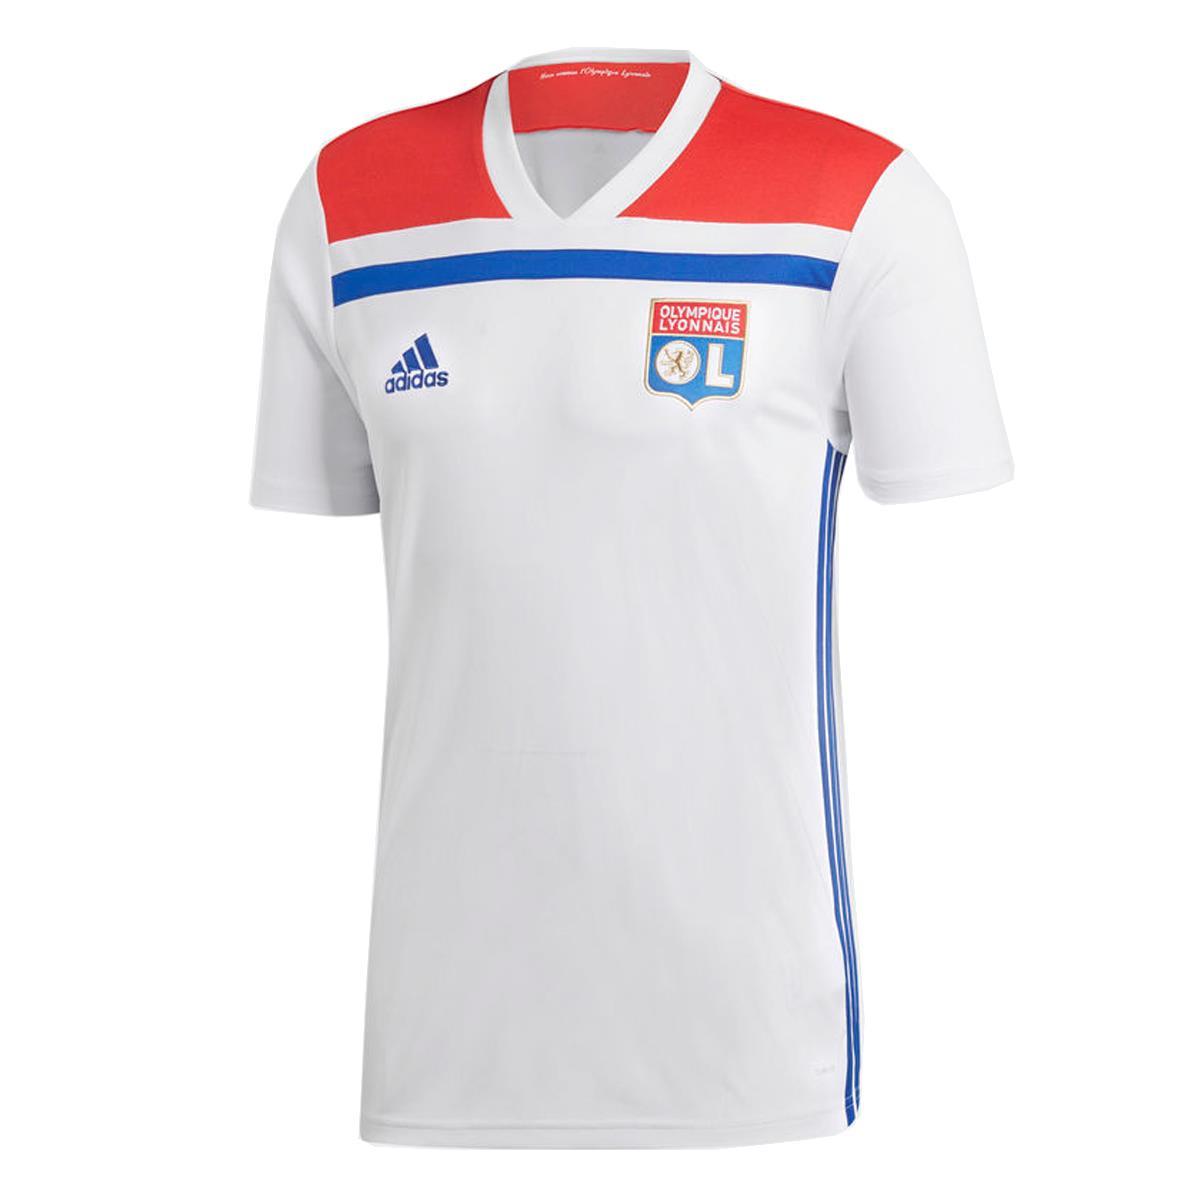 d059d03fe Camisa Adidas Olympique Lyonnais 2018 19 Masculina